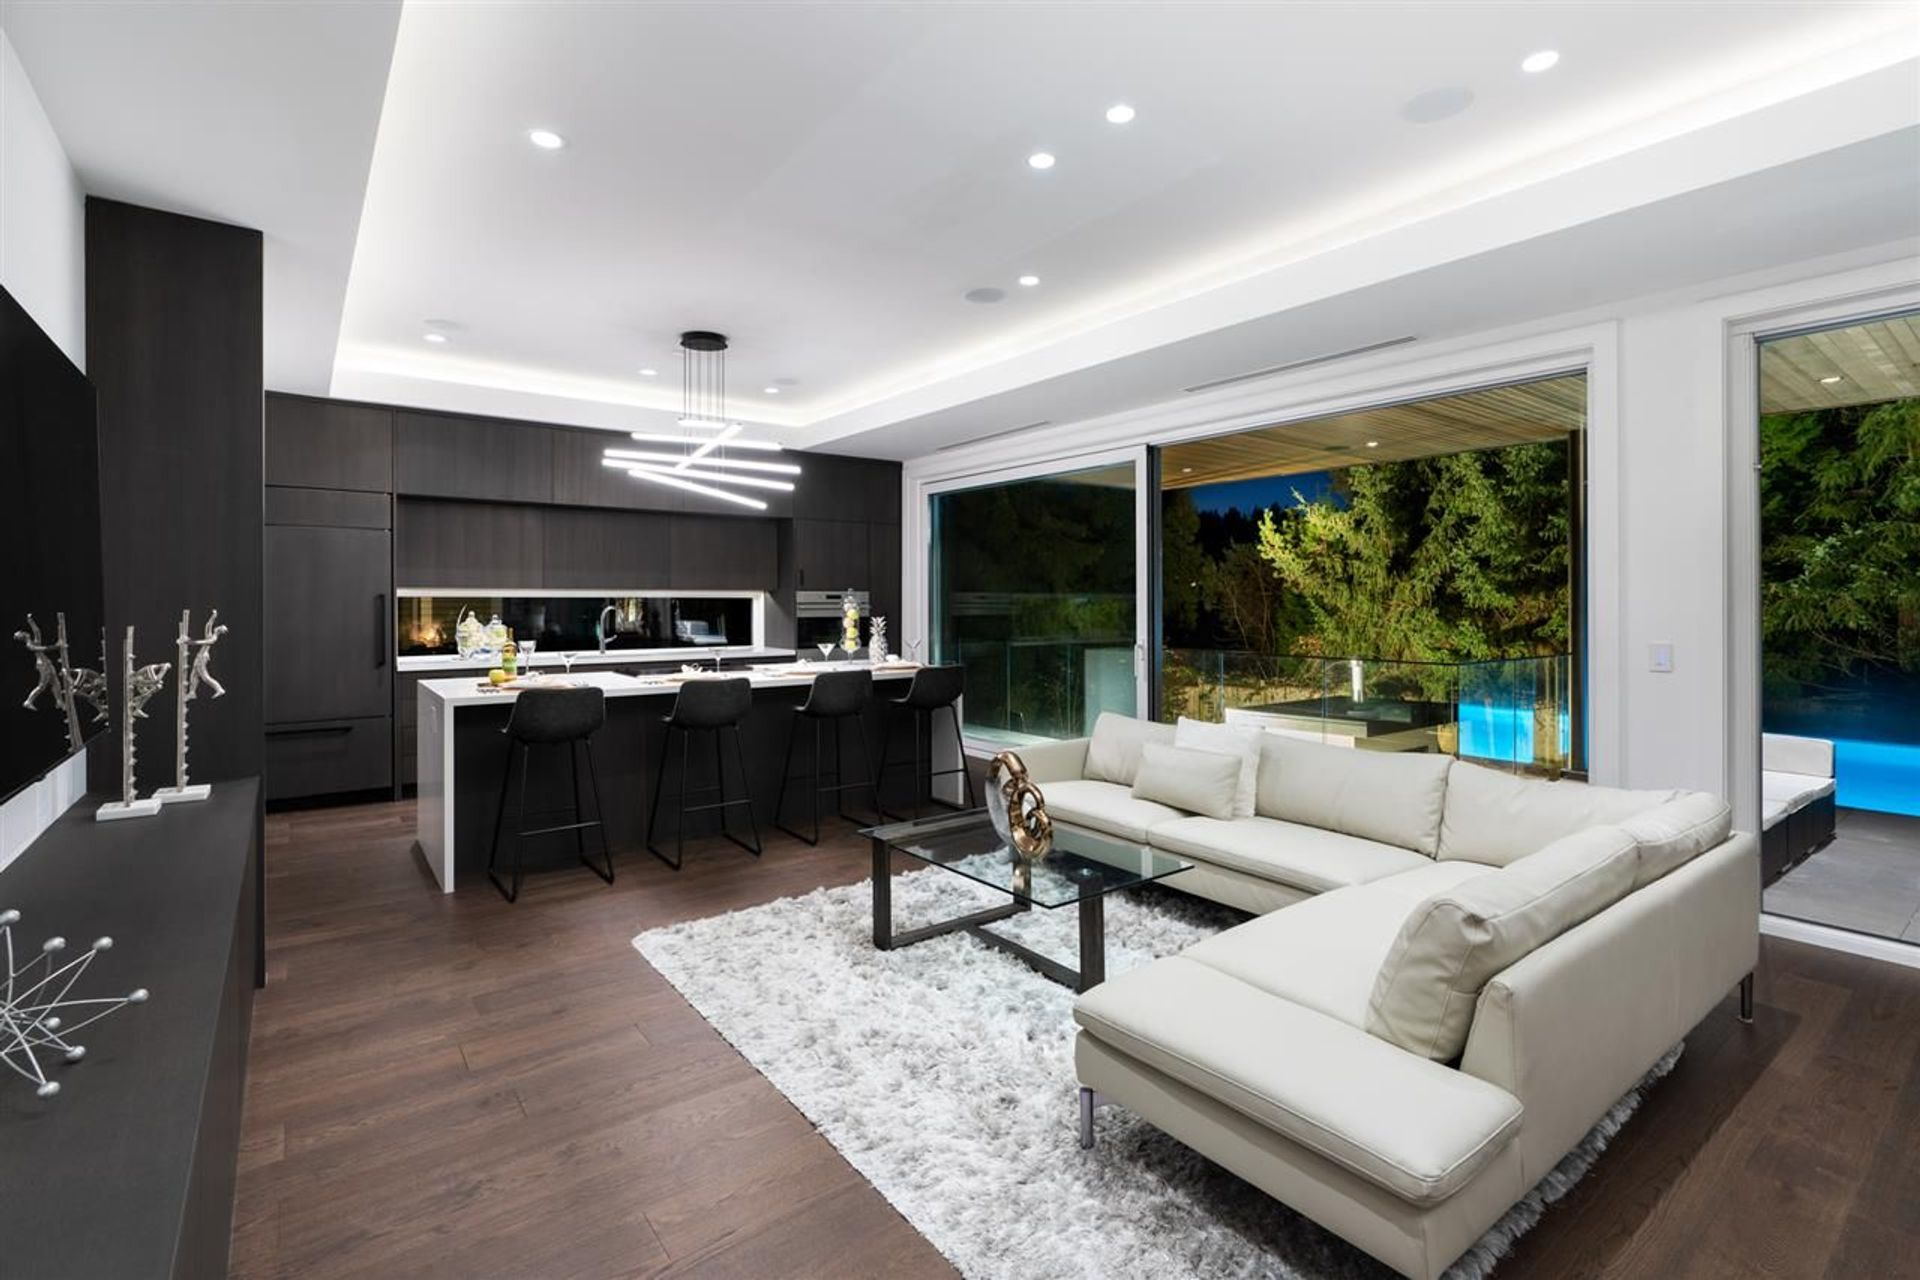 1040-wildwood-lane-british-properties-west-vancouver-12 at 1040 Wildwood Lane, British Properties, West Vancouver